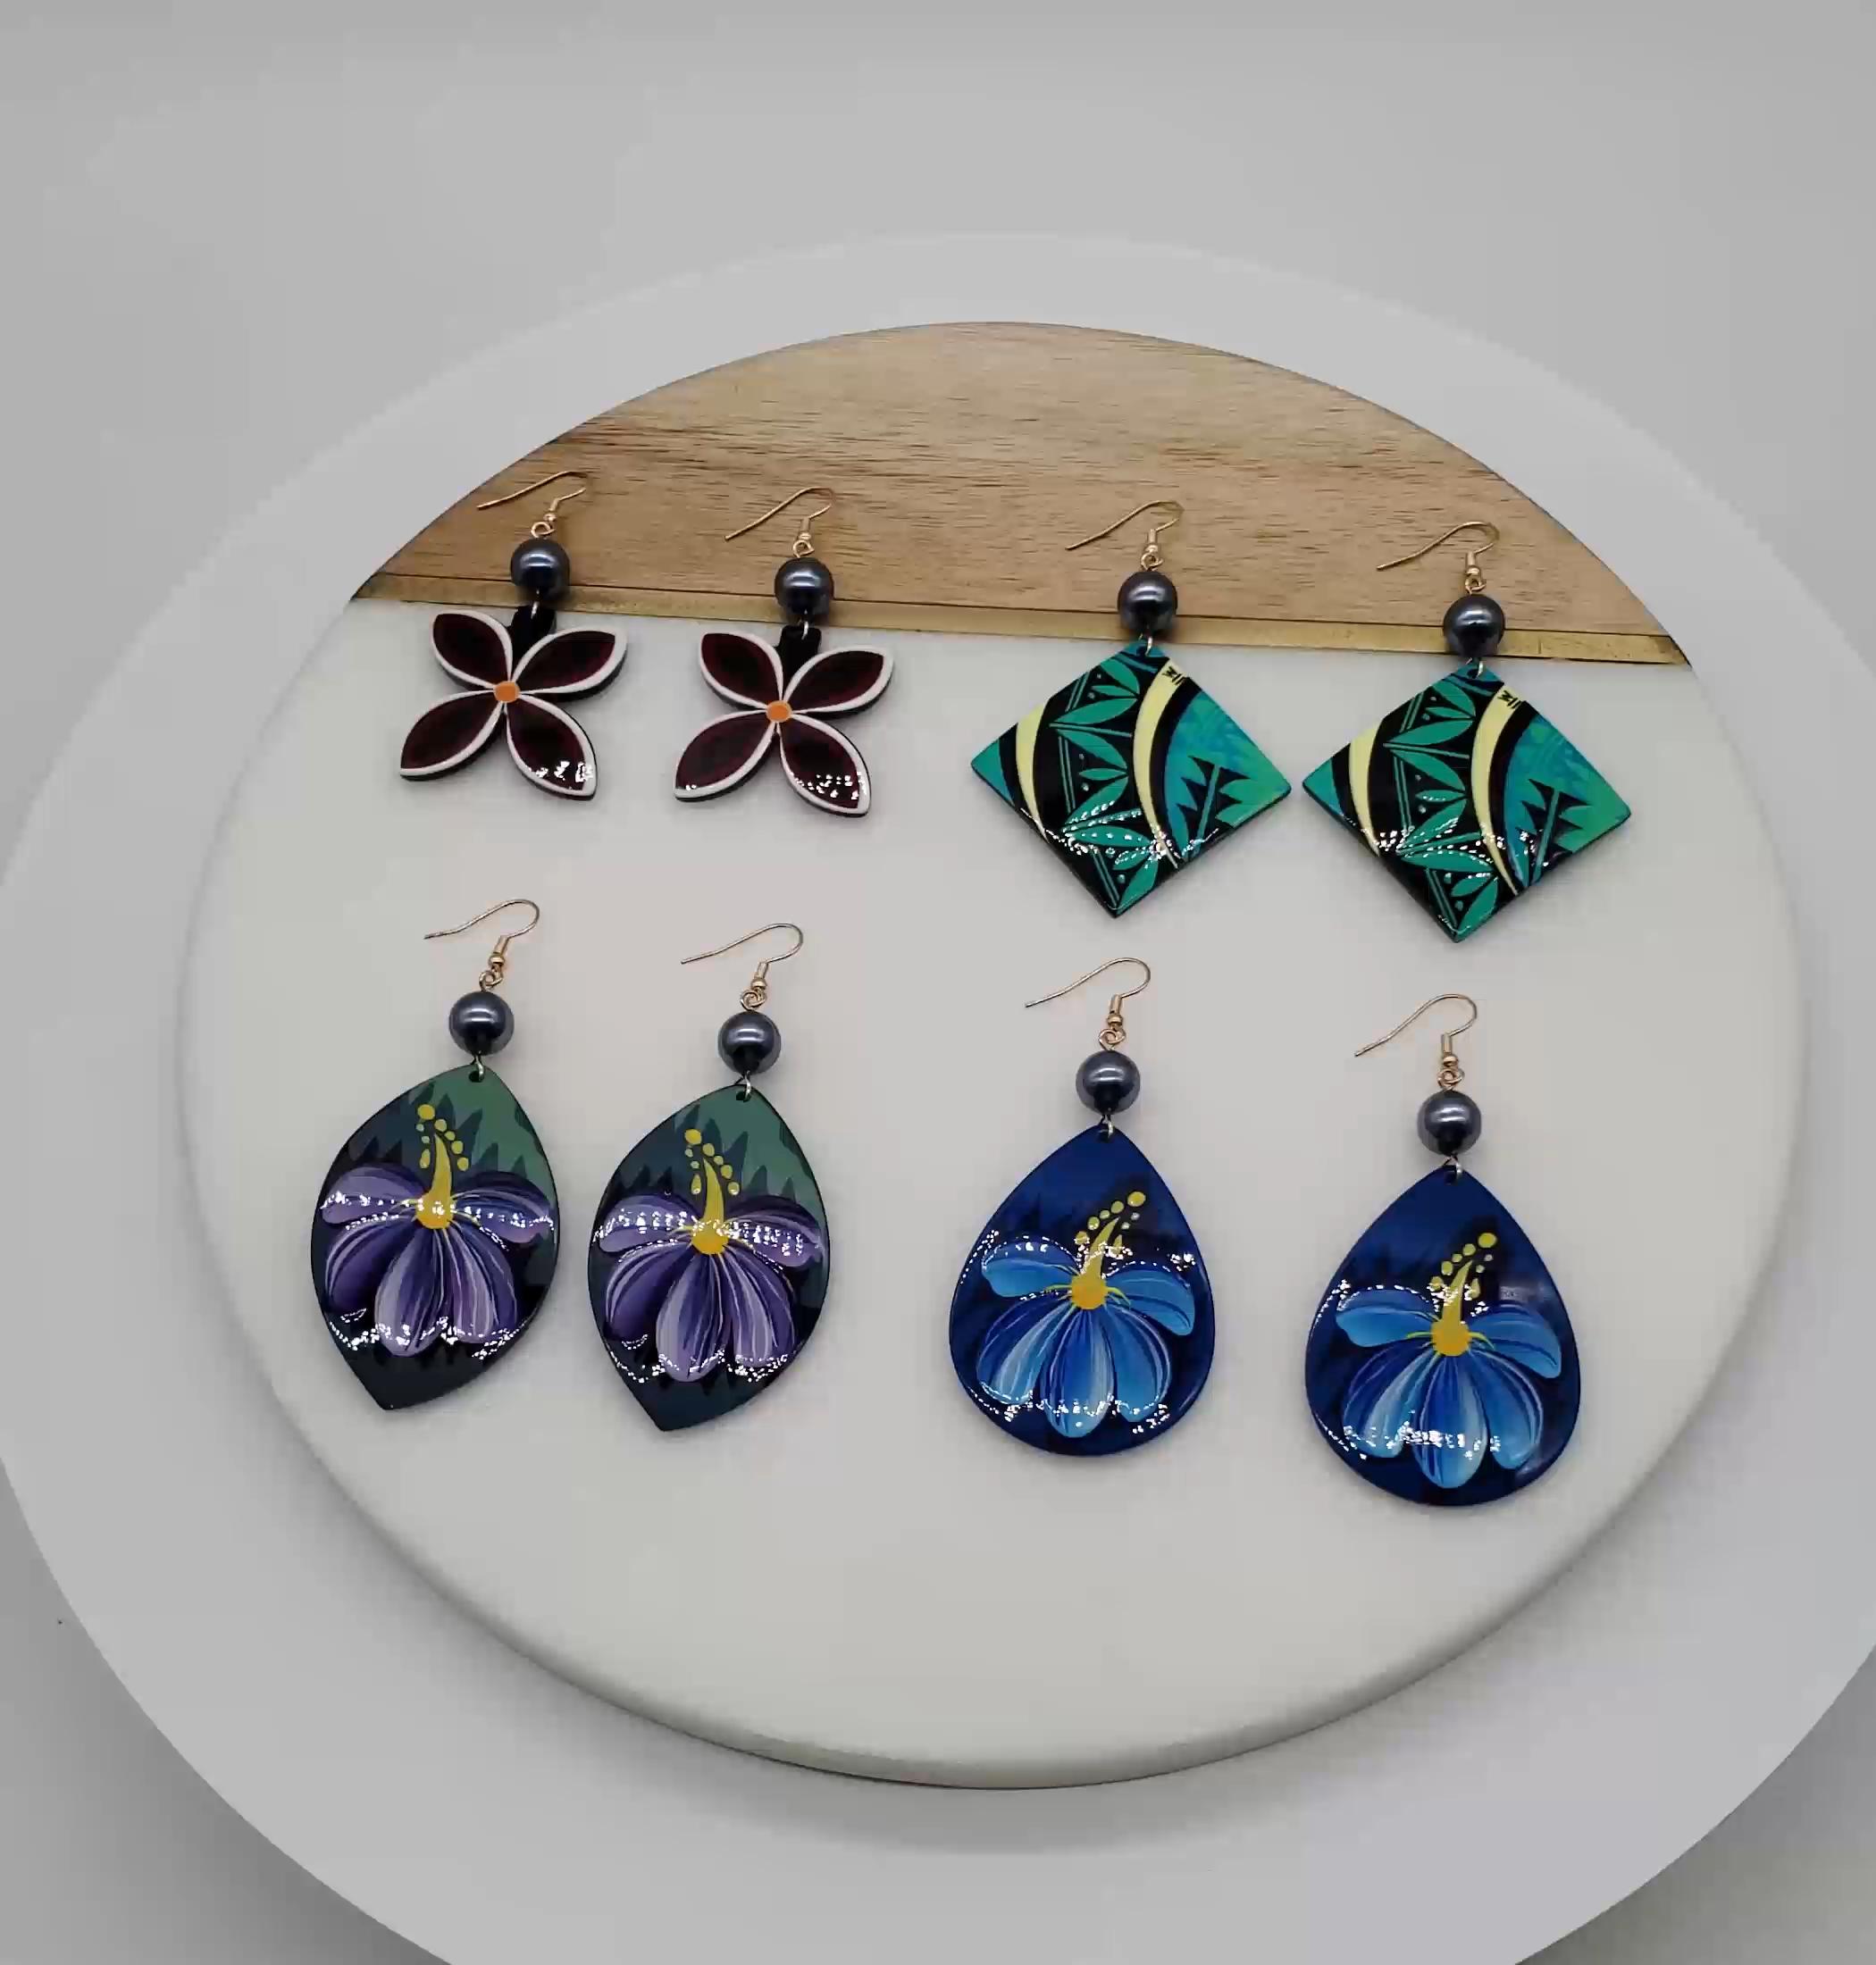 Stylish New Design Acrylic Flower Pattern Custom Hawaiia Jewelry Earrings For Women